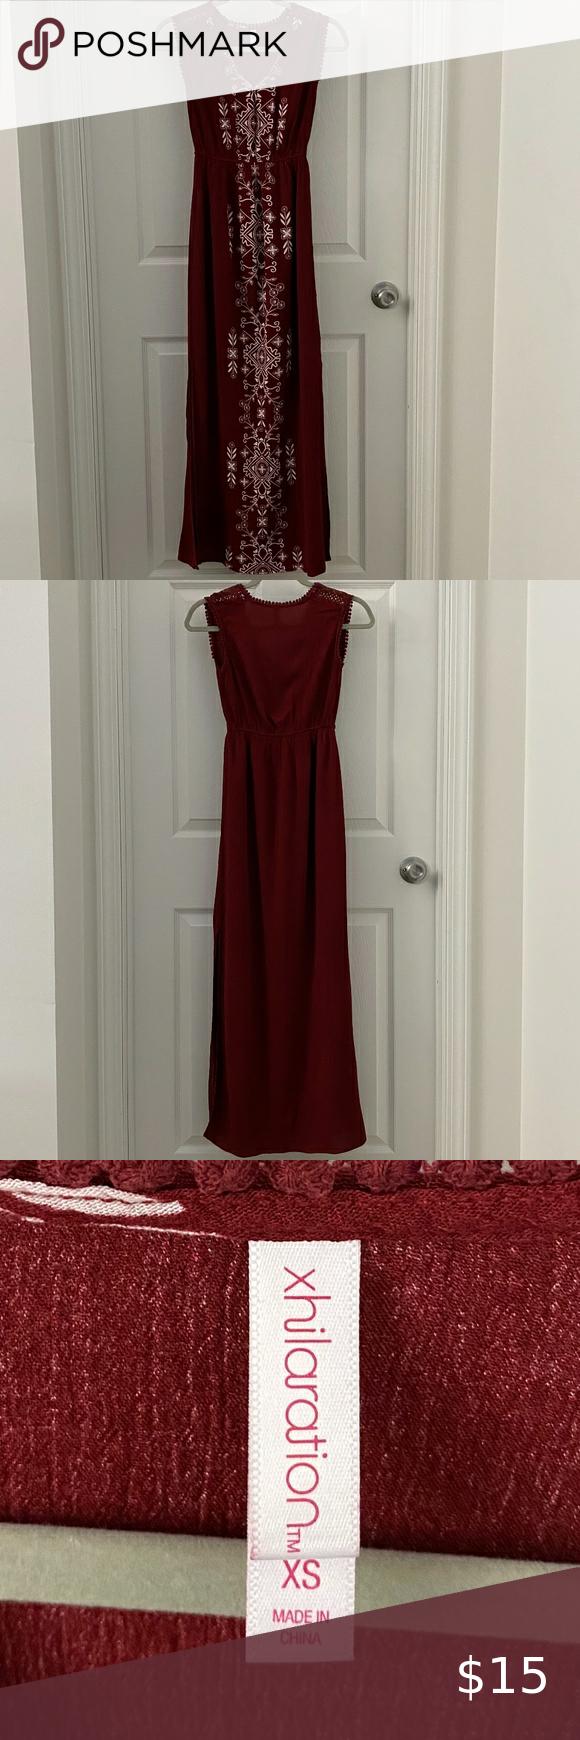 Xhilaration Maxi Dress Size Xs In 2020 Dresses Maxi Dress Xhilaration [ 1740 x 580 Pixel ]